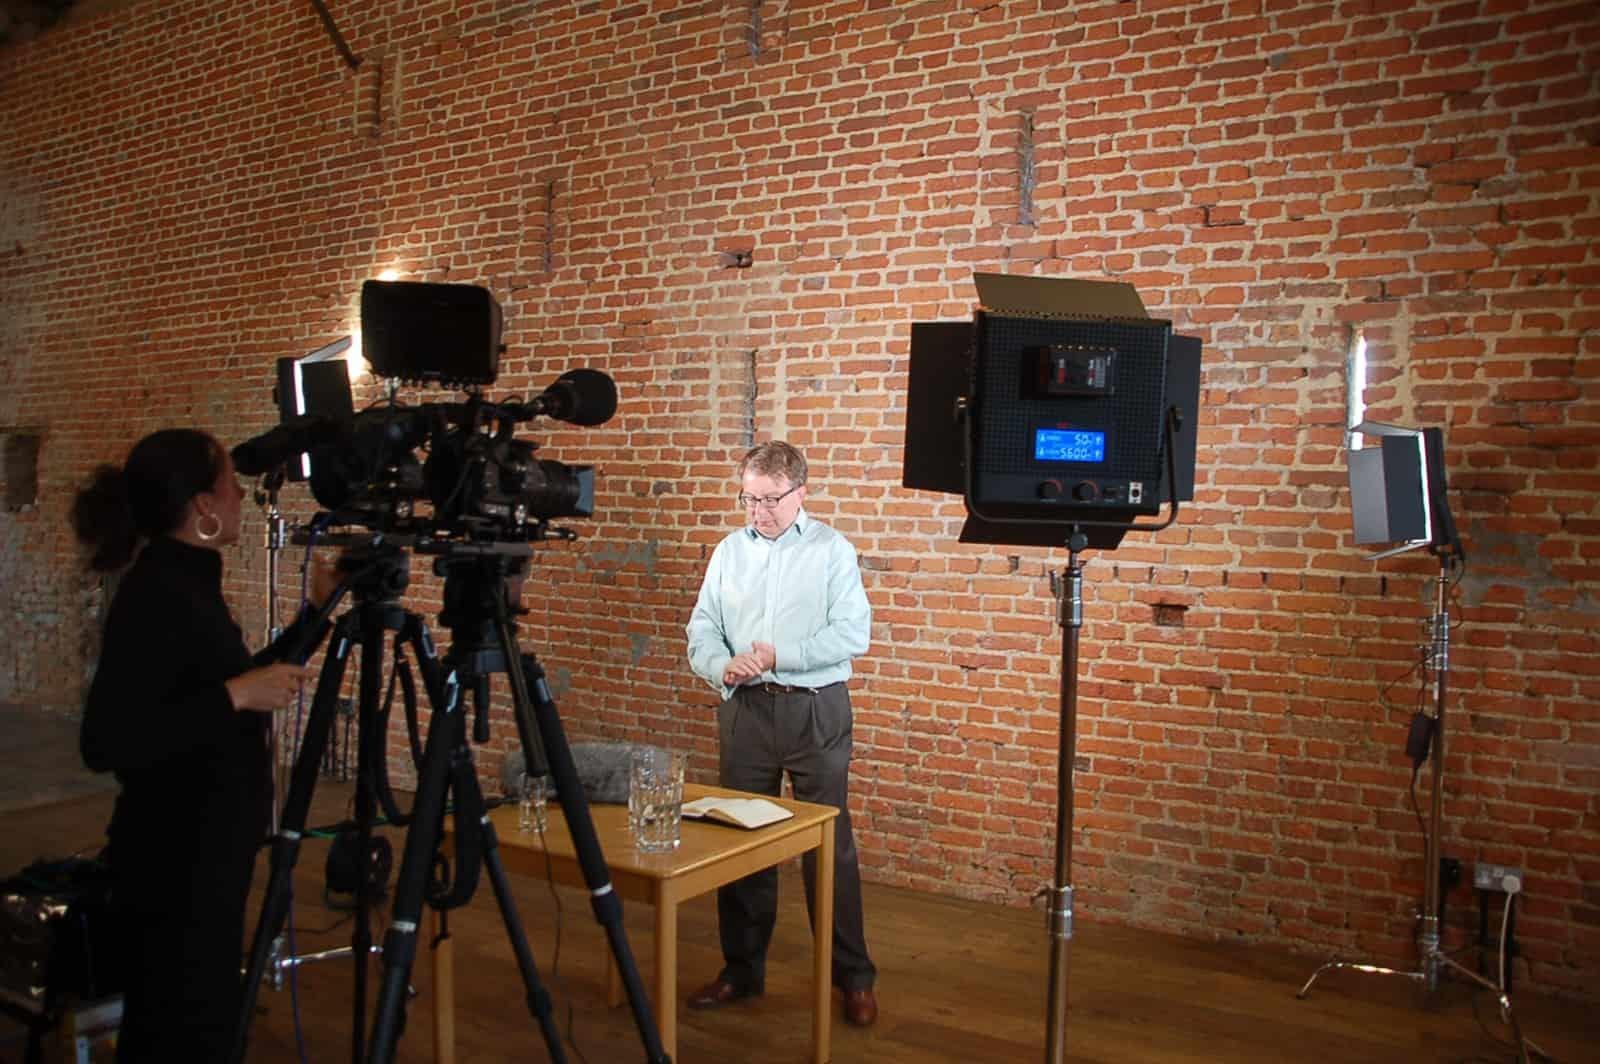 Video recording set up